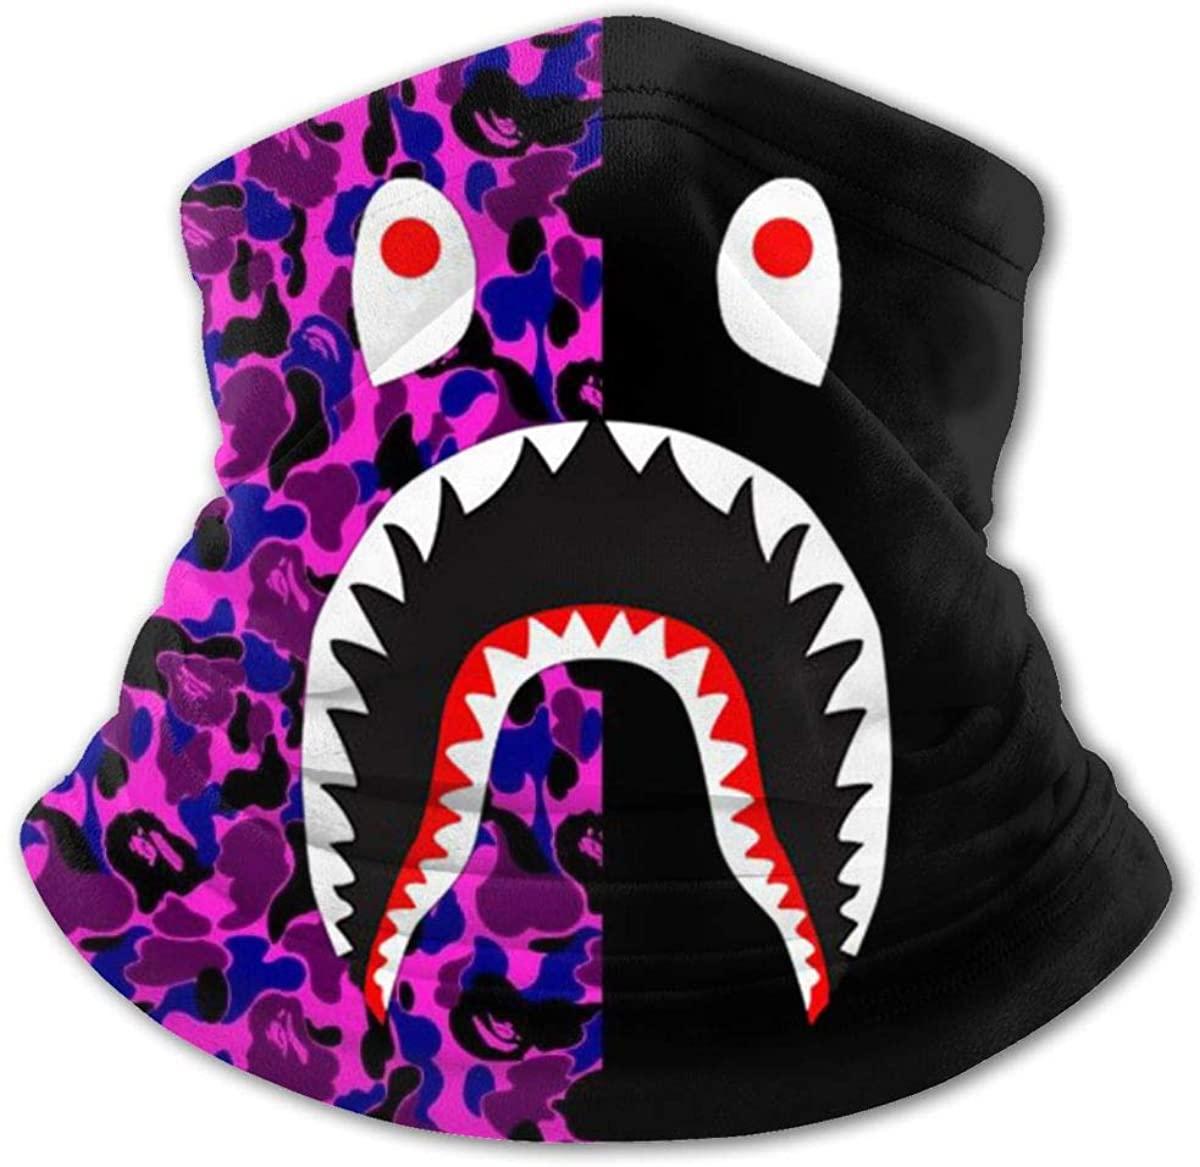 Bape Blood Shark Youth Face Mask Bandanas Neck Gaiter Headband Boy Girl Scarf Balaclava for Cycling Hiking Sport